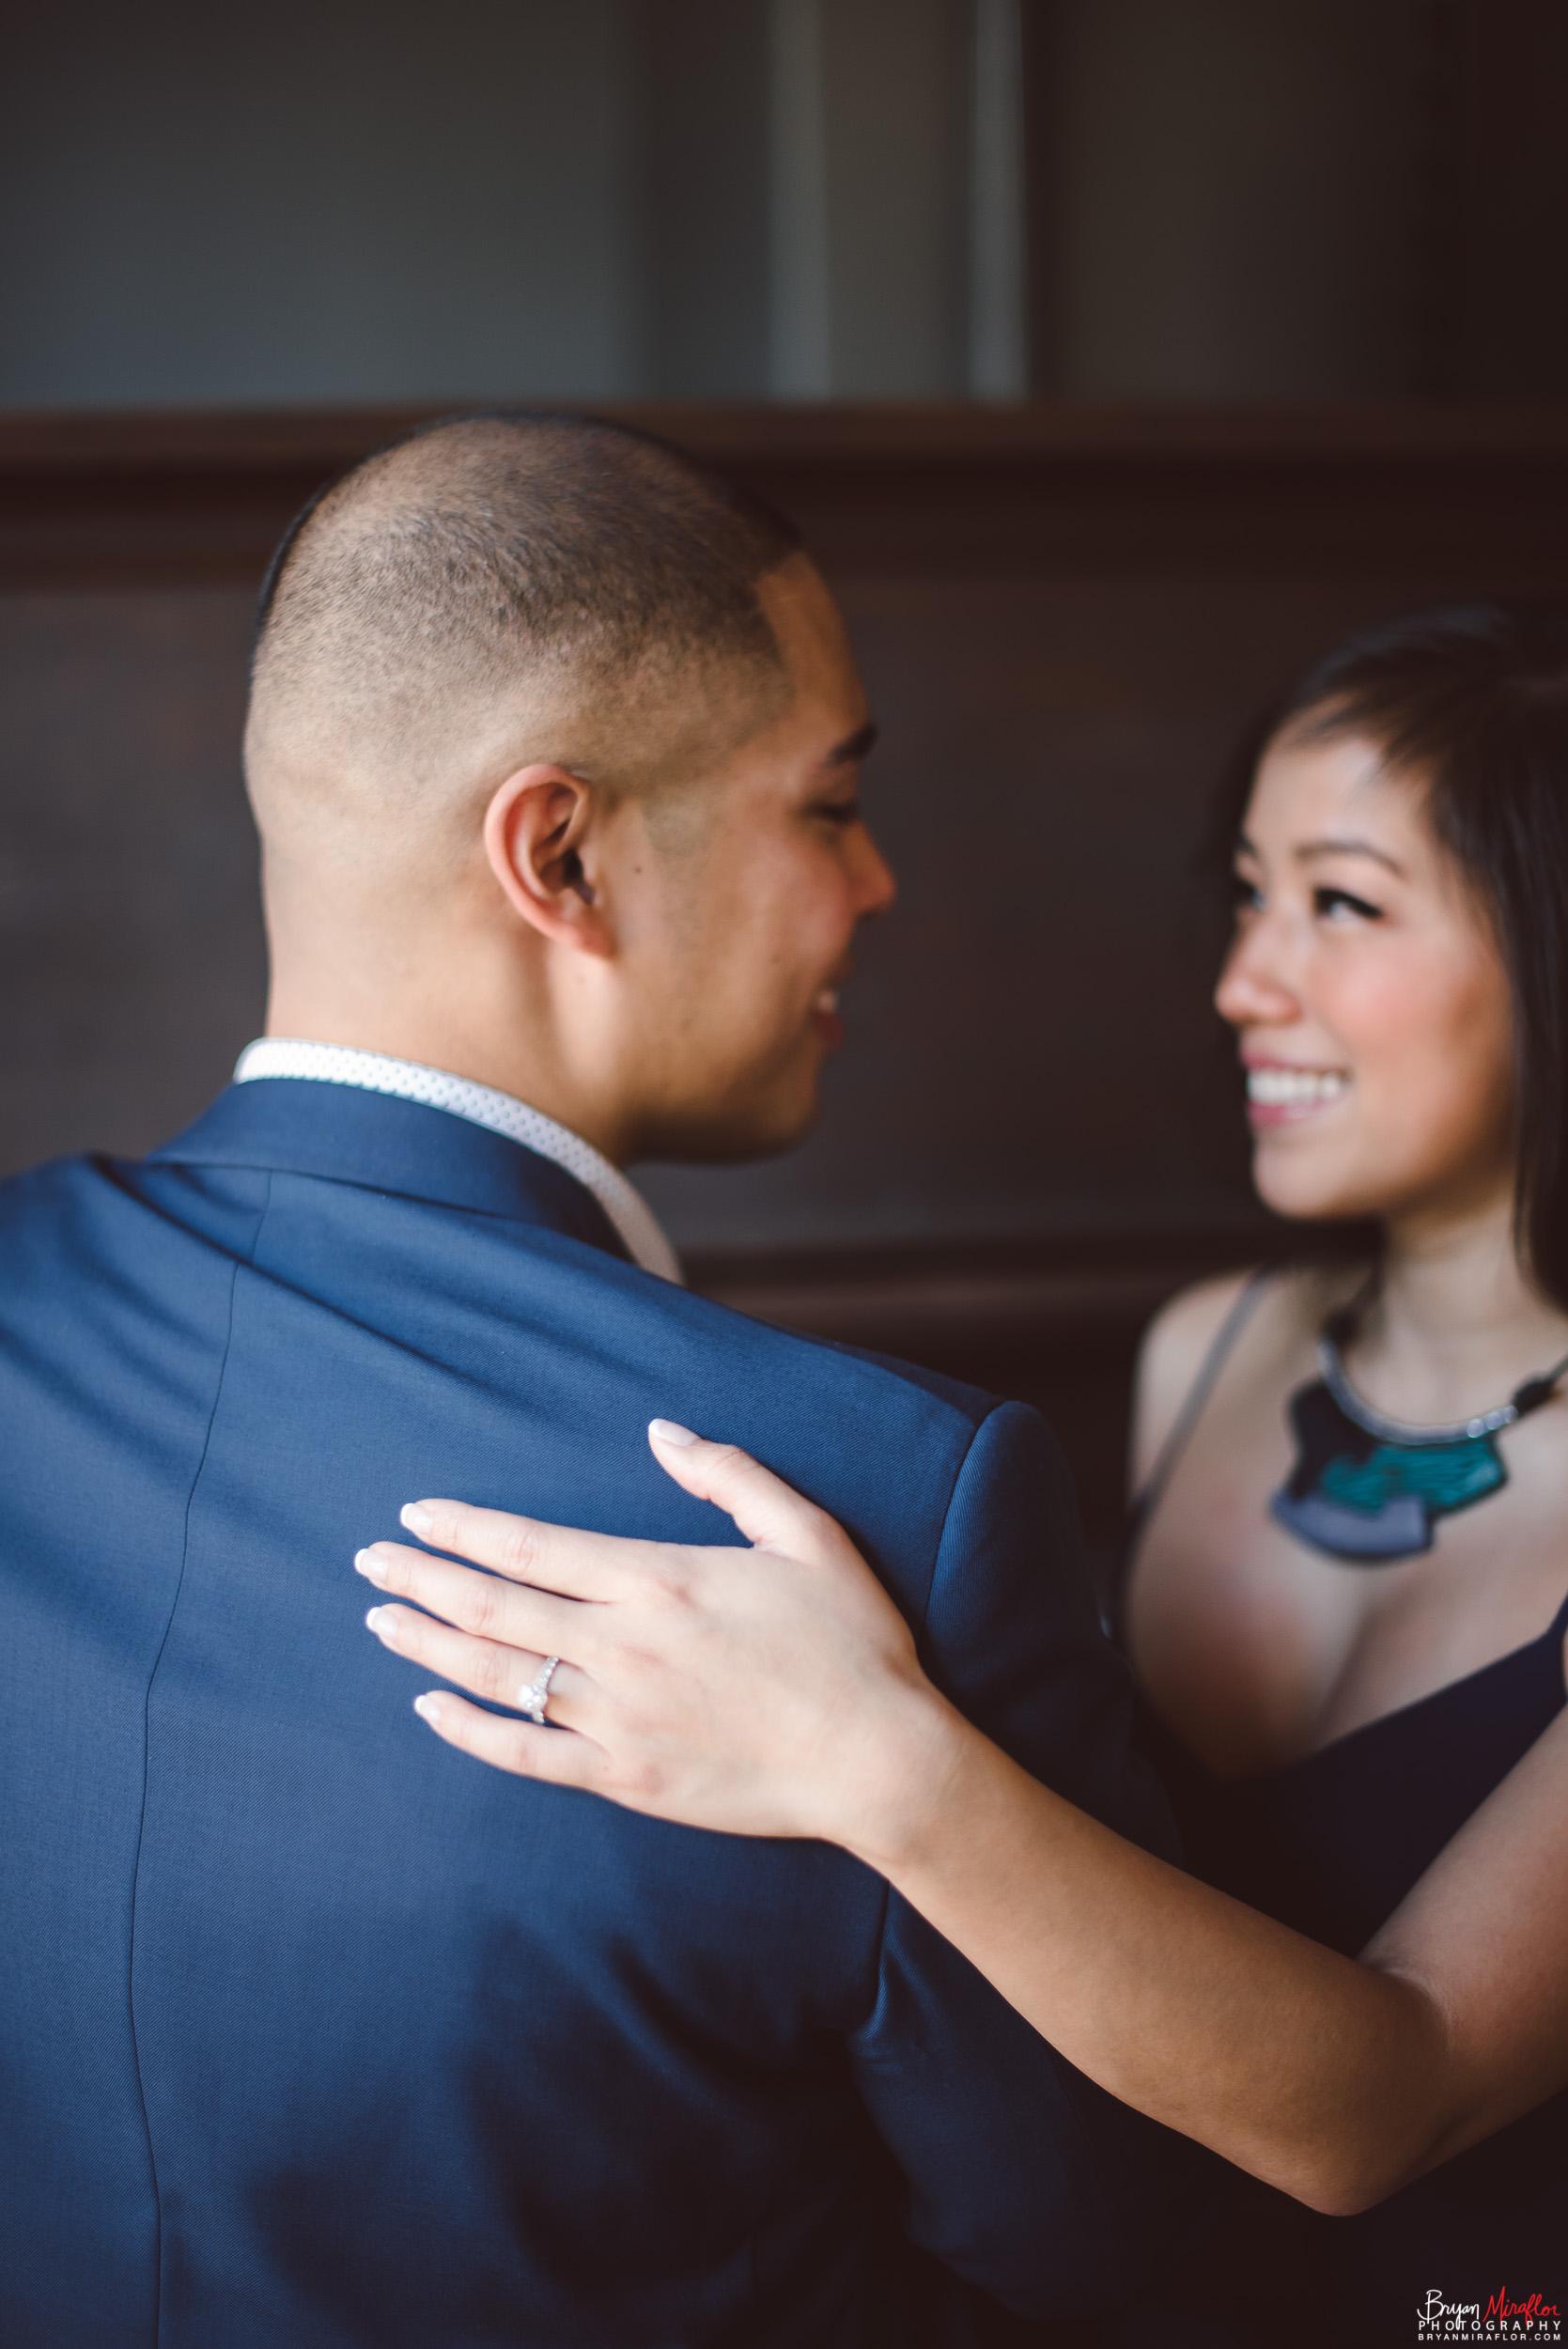 Bryan-Miraflor-Photography-Trisha-Dexter-Lopez-Engagement-Formal-DTLA-Arts-20170129-0159.jpg